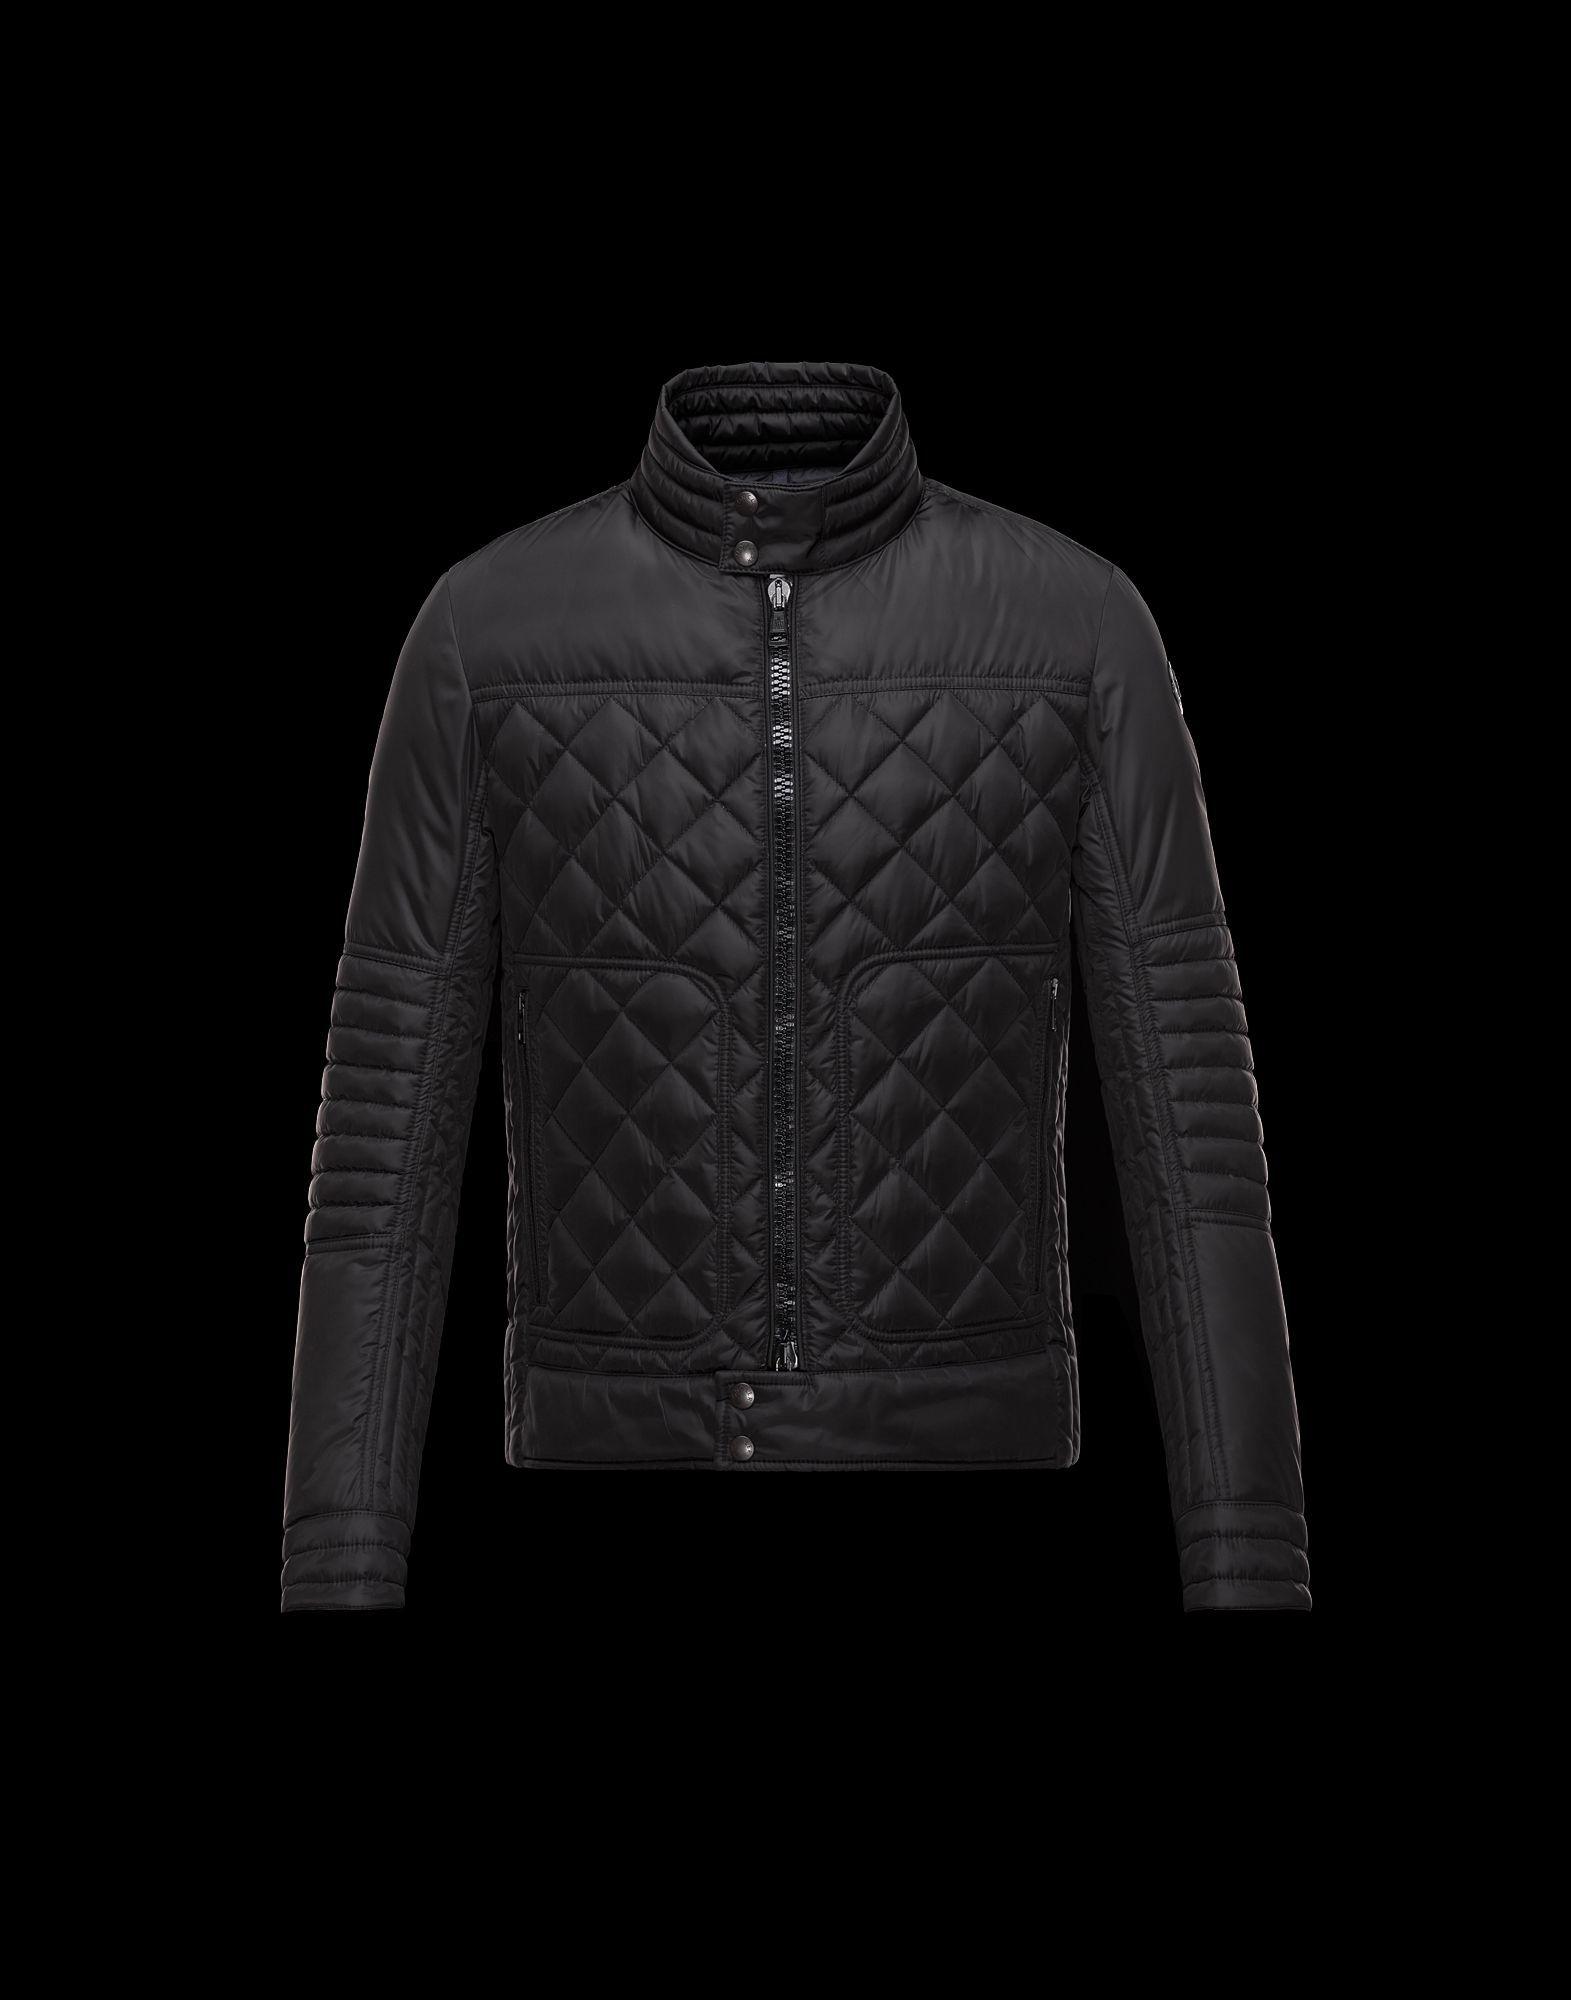 moncler freddie jacket